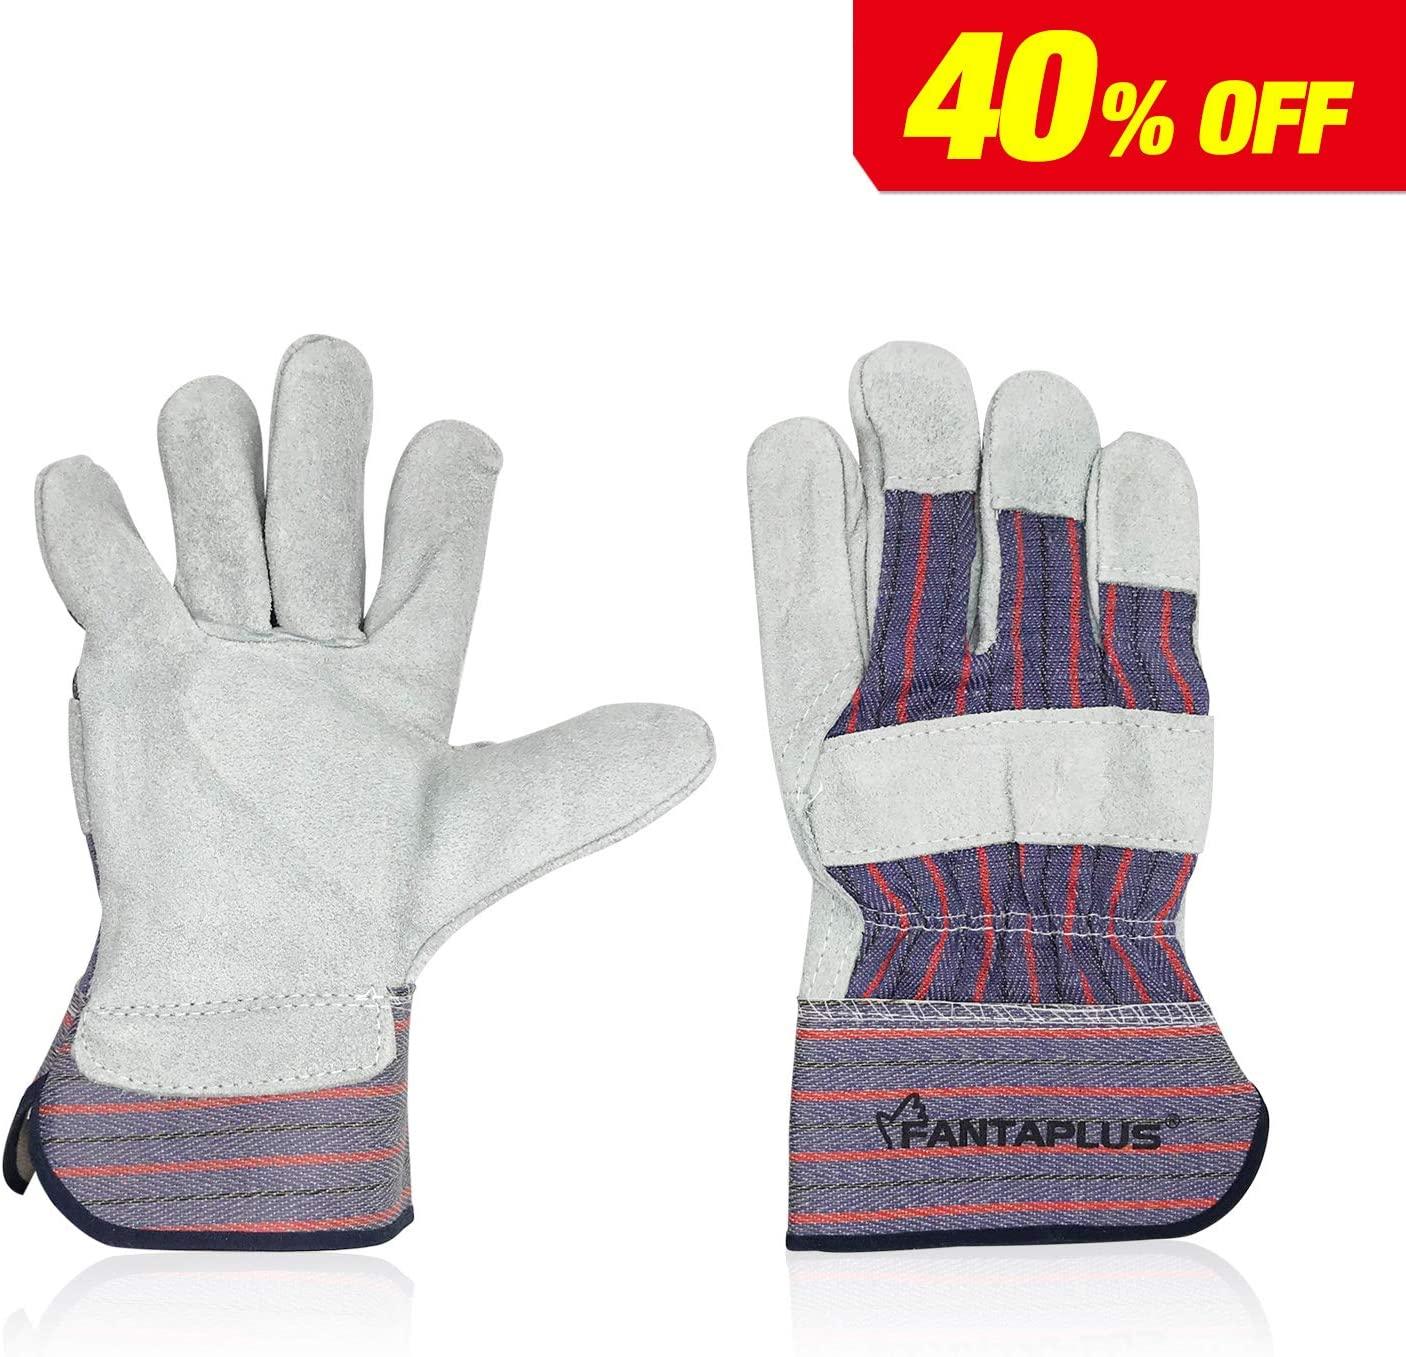 FANTAPLUS 10.5Welding Gloves Heat Resistant Wear Resistant (White and Blue)